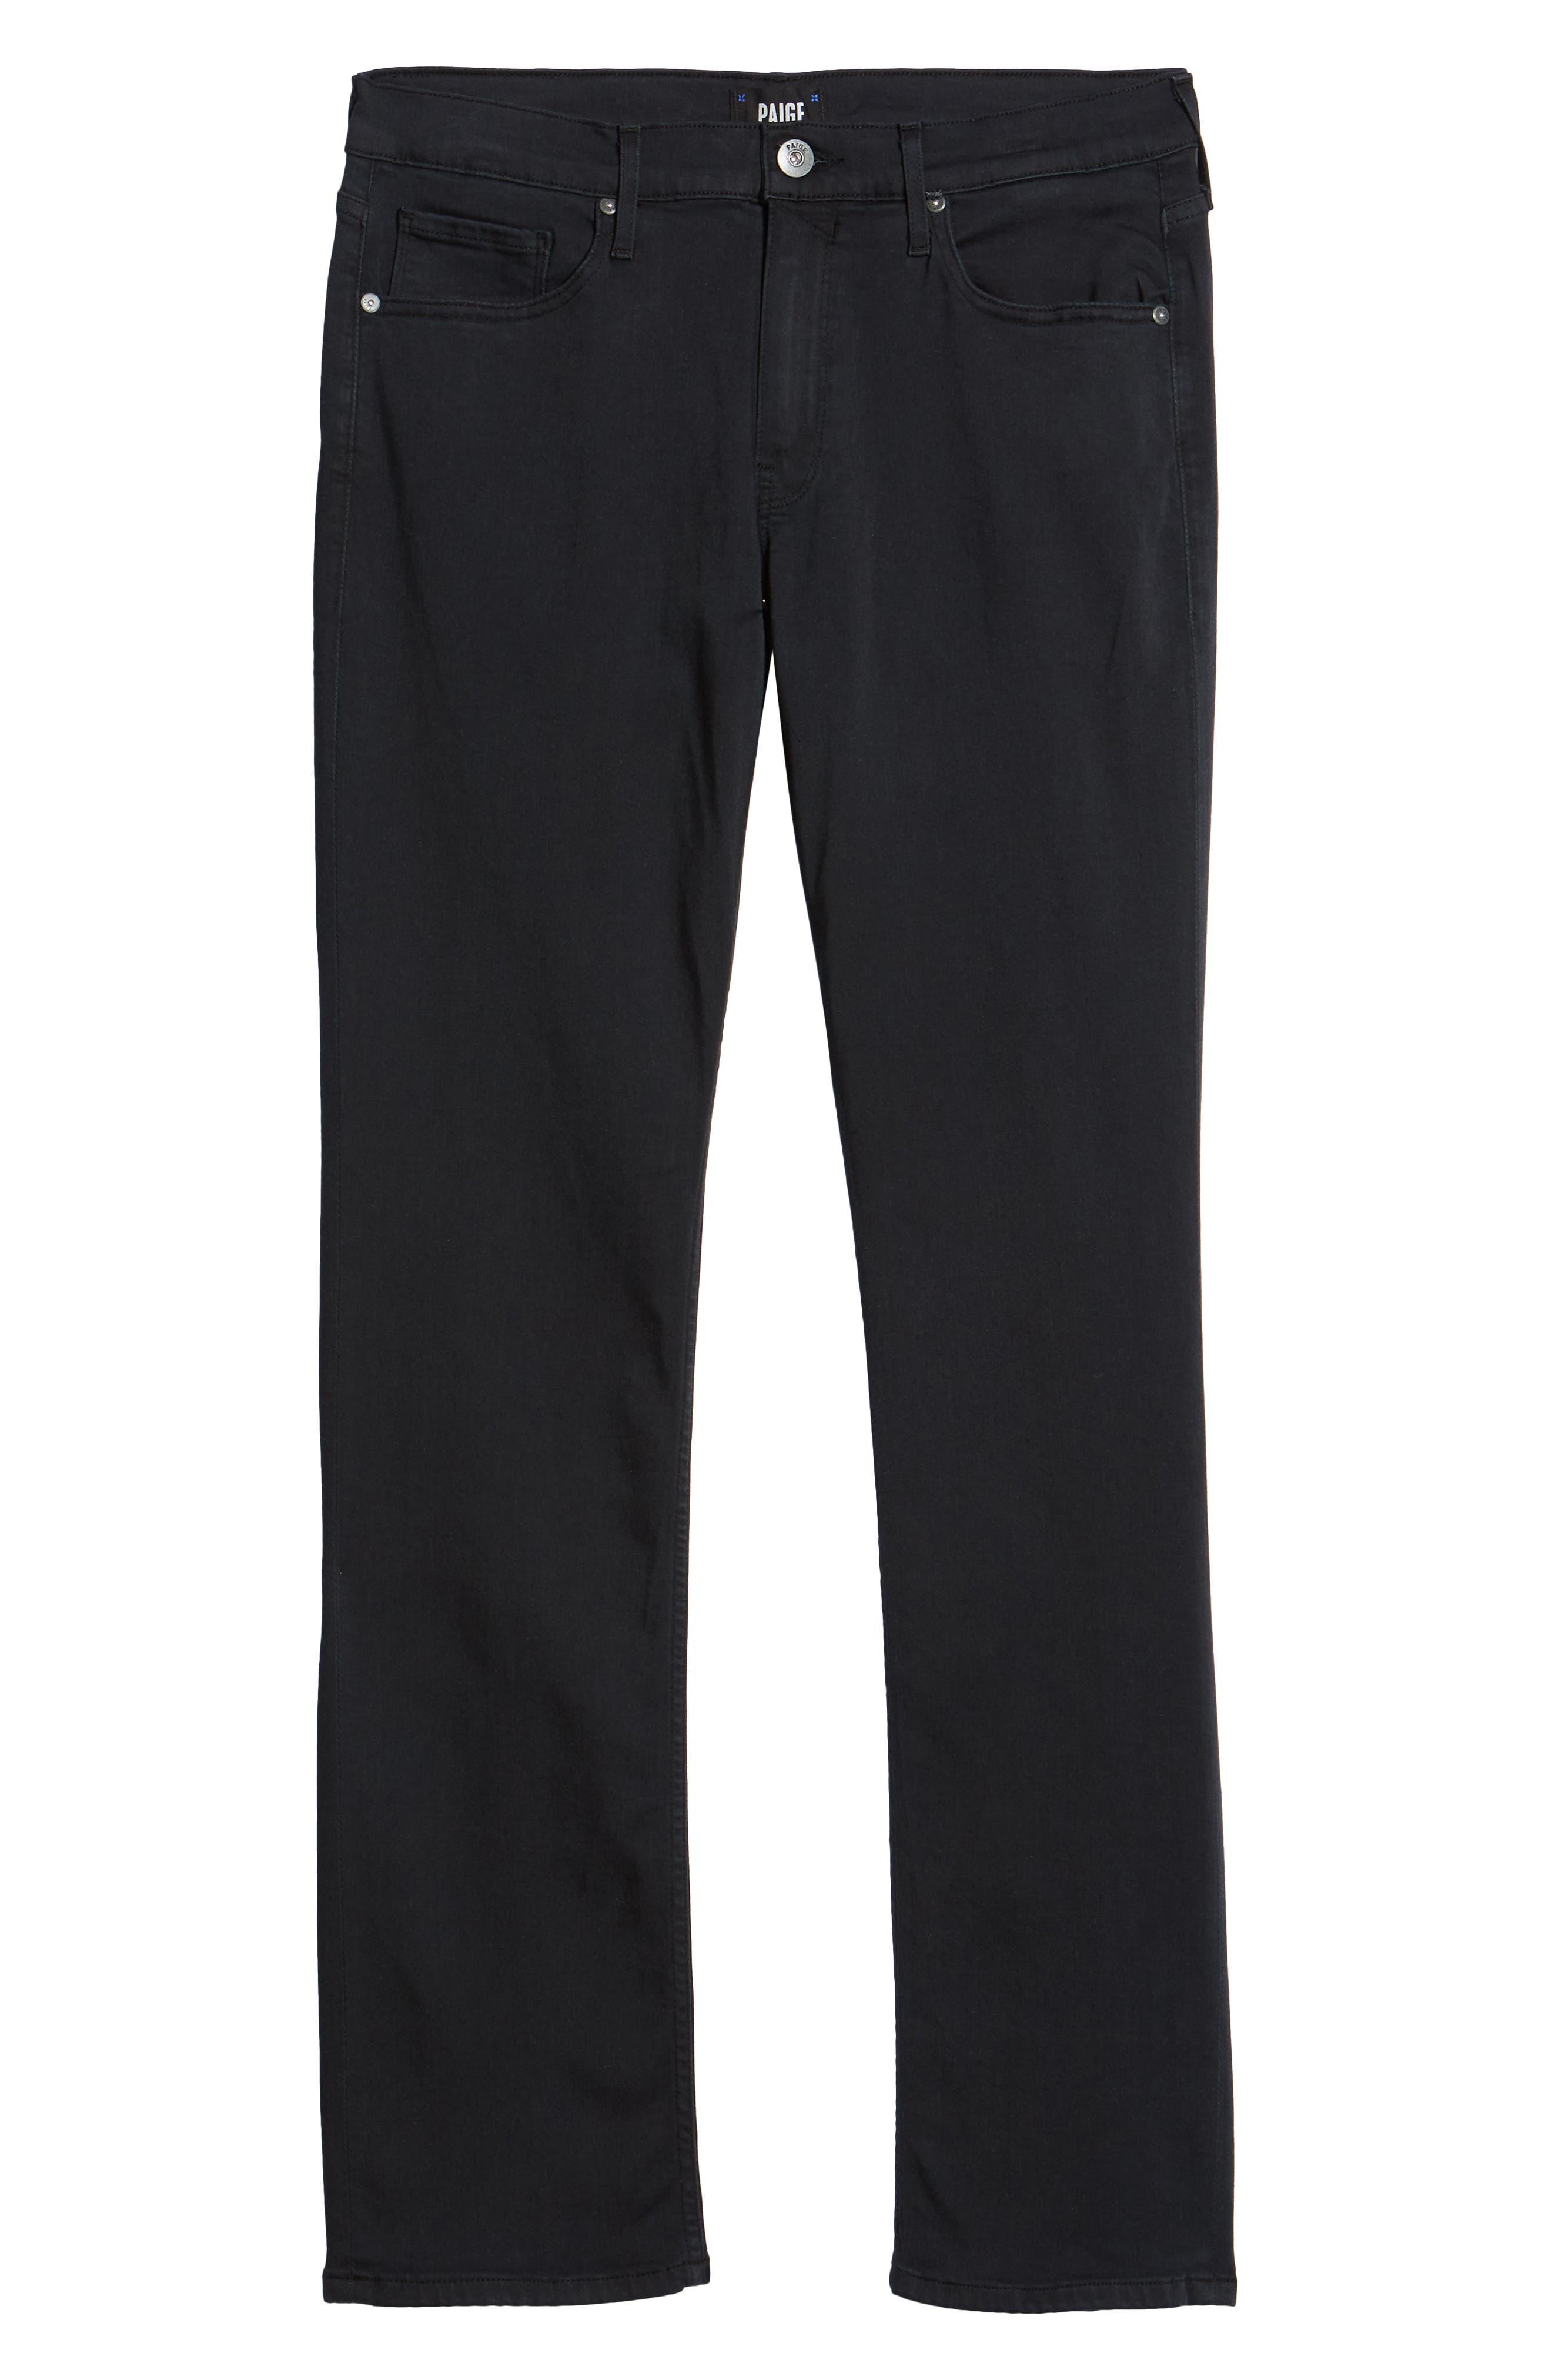 Normandie Straight Leg Jeans,                             Alternate thumbnail 6, color,                             Jeff